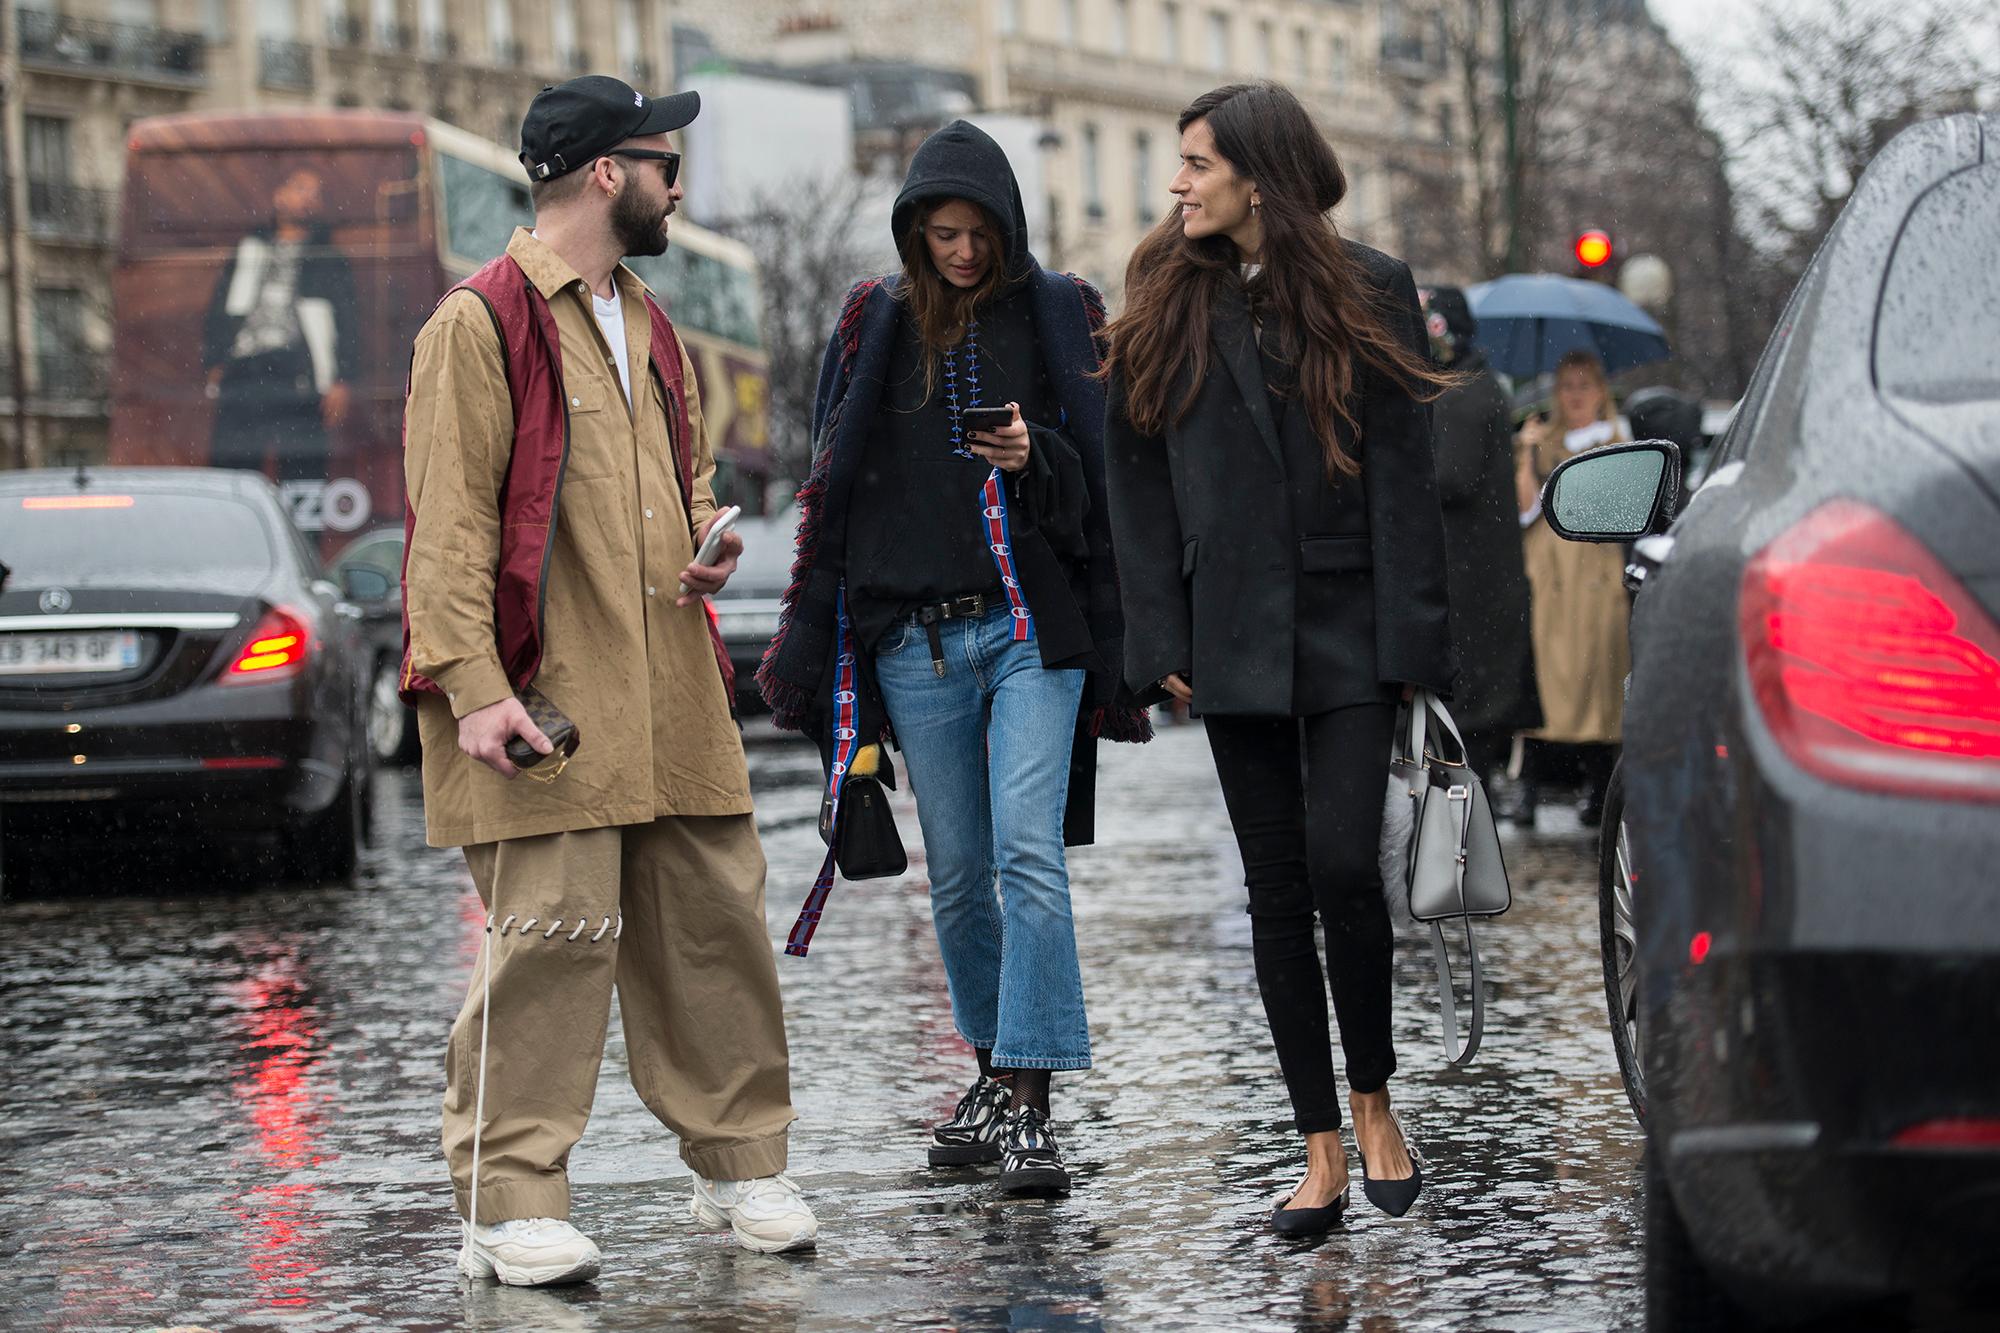 Streetsnaps Paris Fashion Week March 2017 Part 2 - 3747924